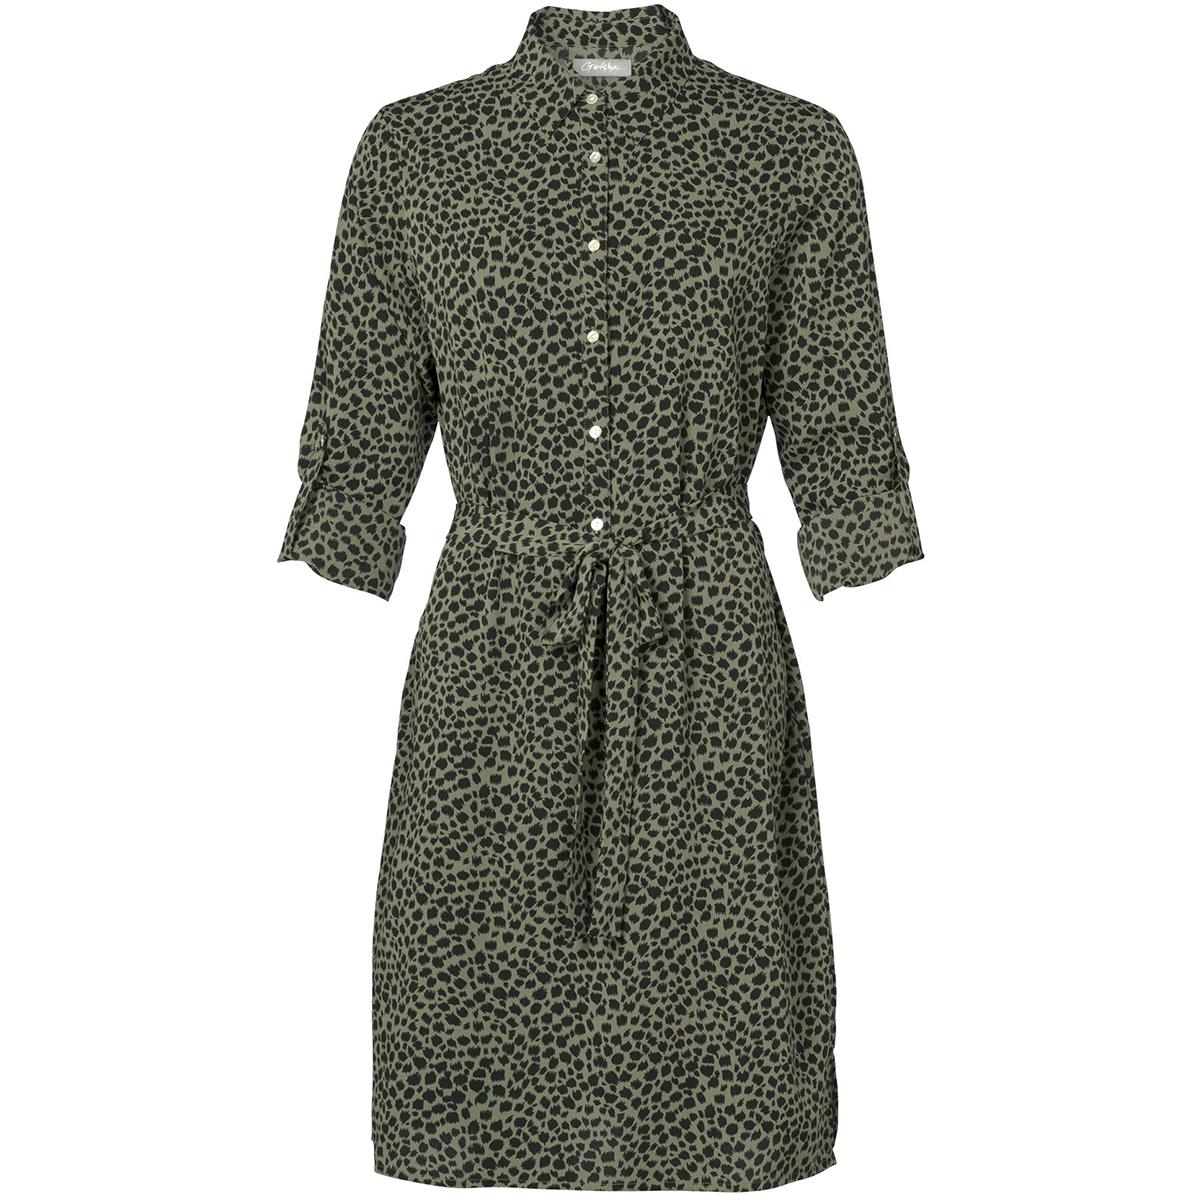 dress with buttons aop leopard 97853 21 geisha jurk 000550 army/black panter